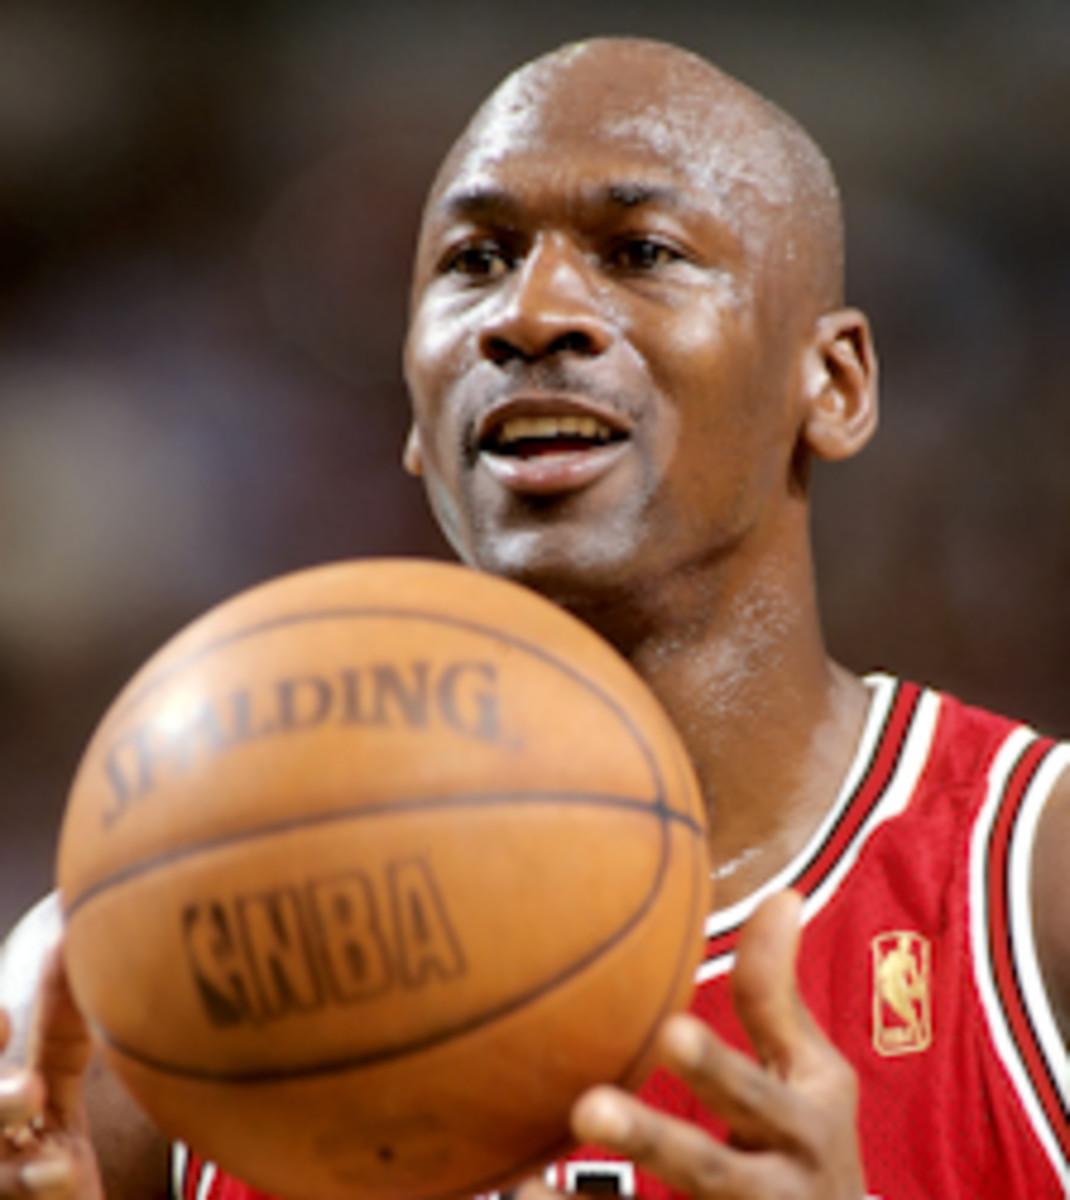 Michael Jordan playing for the Chicago Bulls